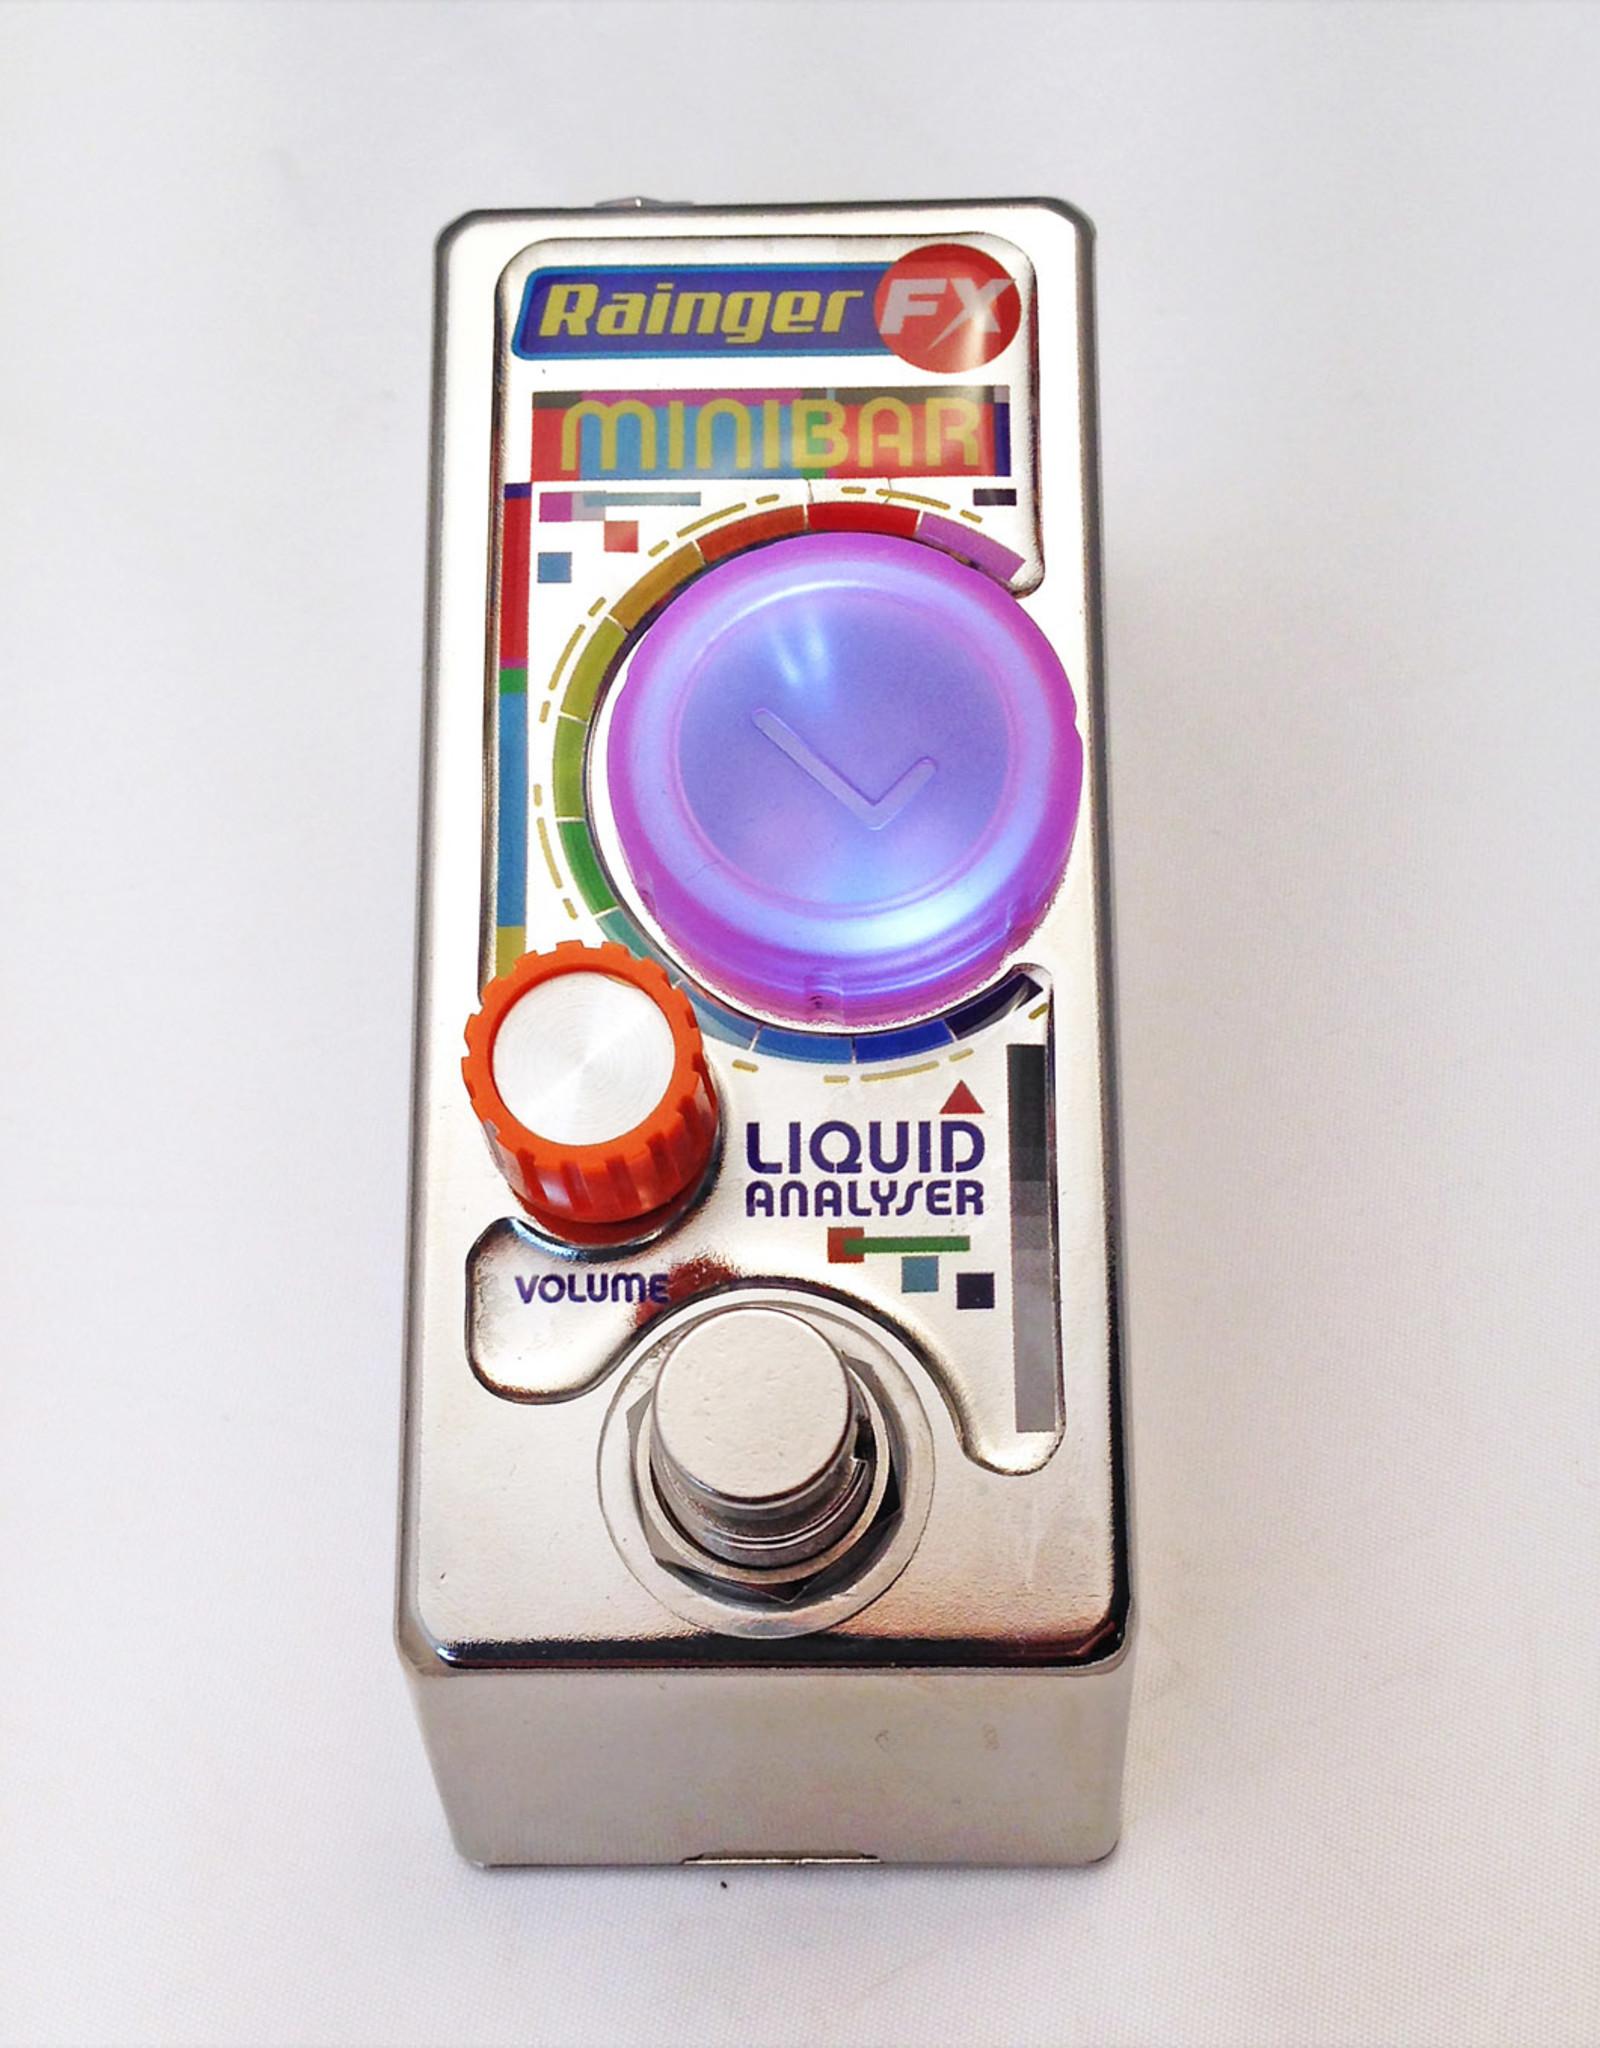 Rainger Rainger Minibar